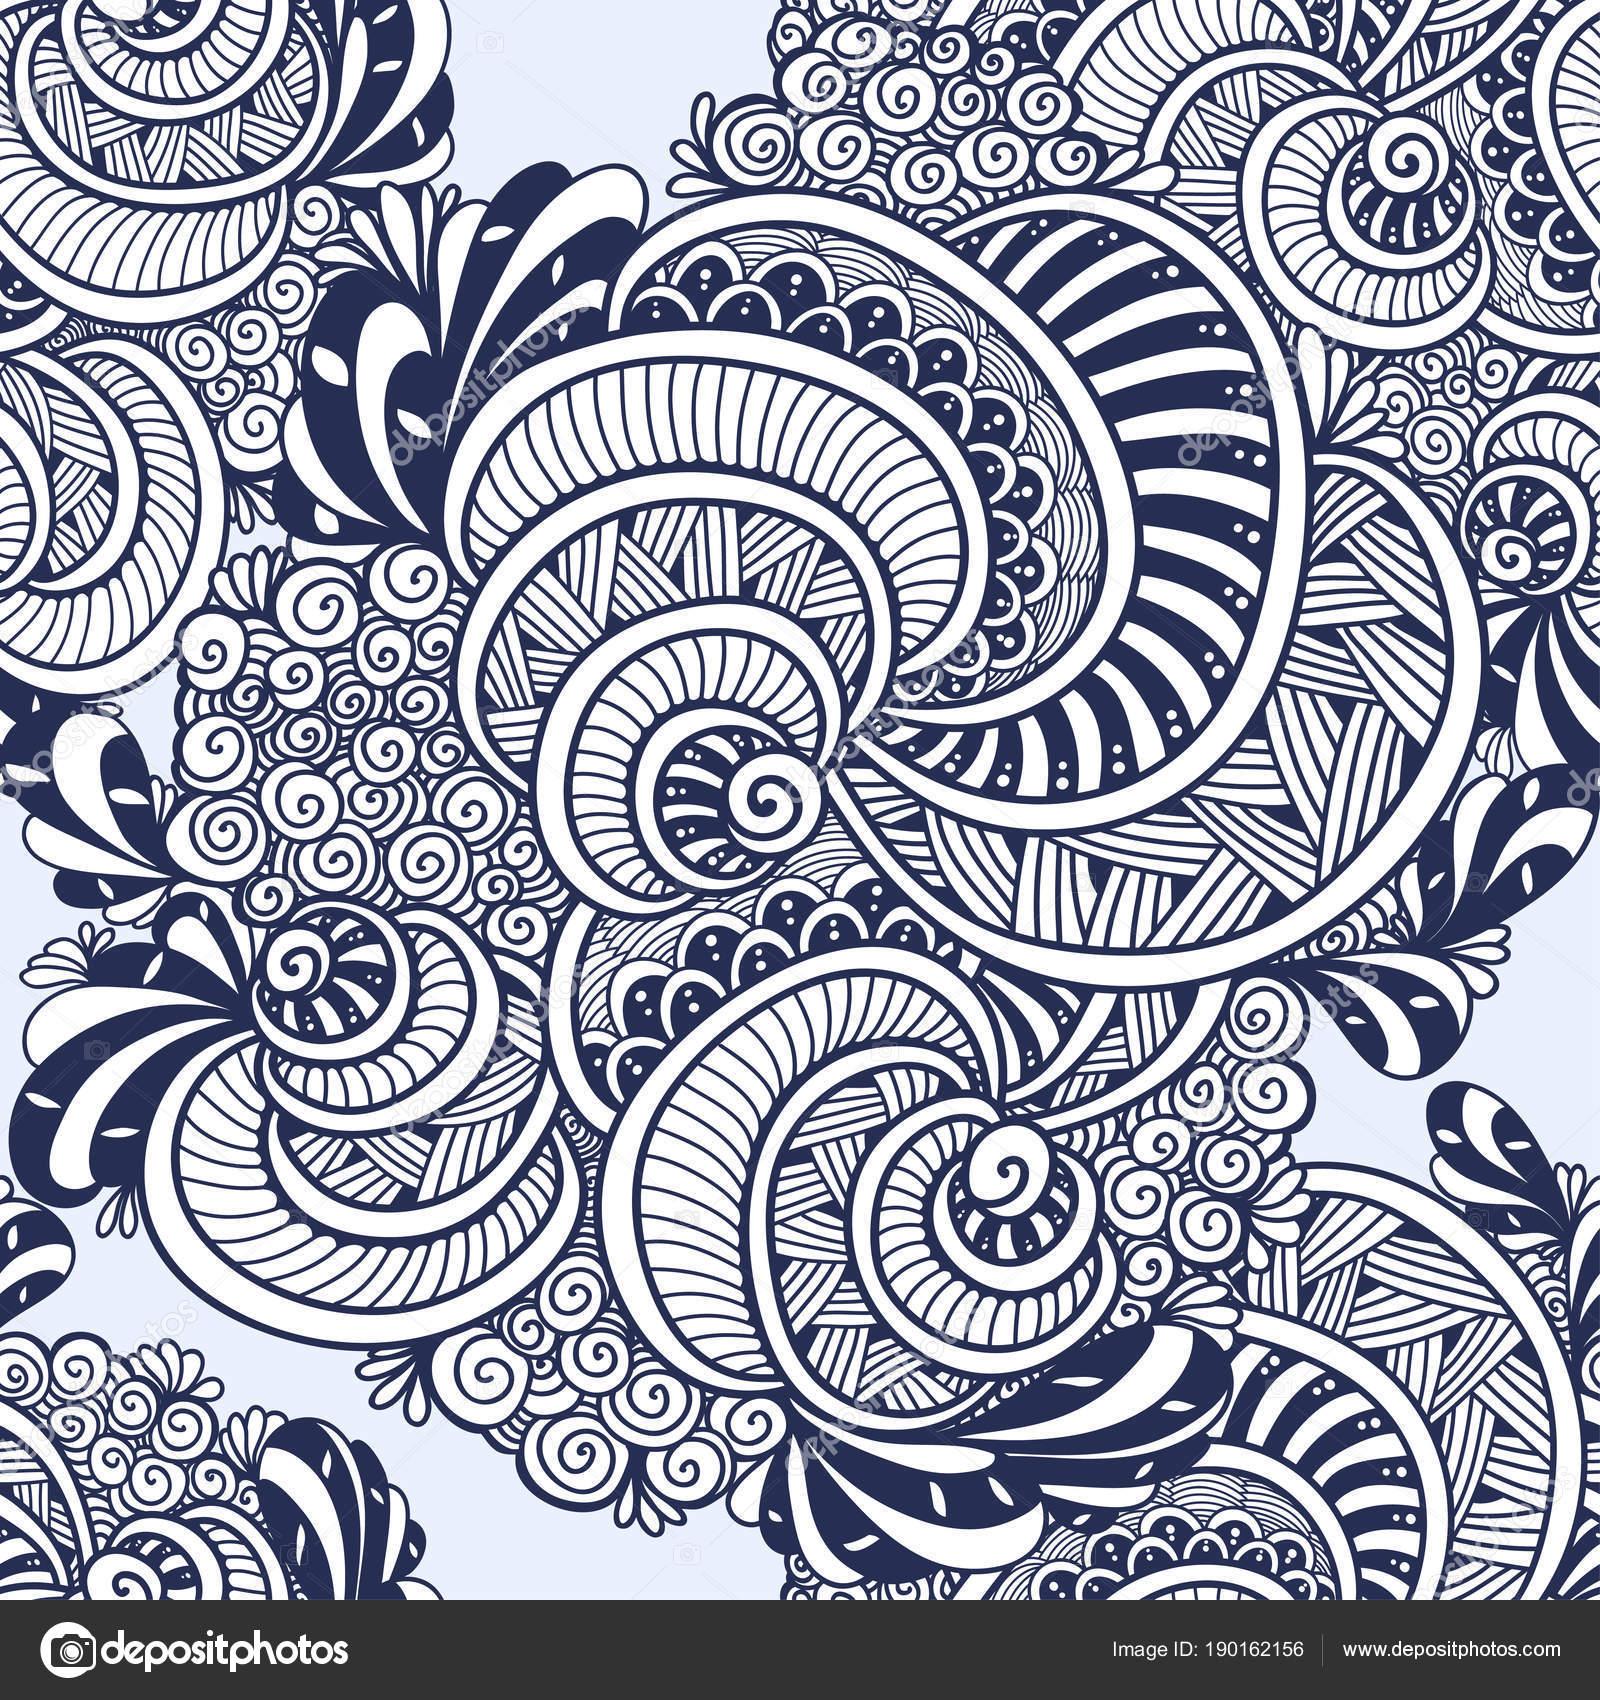 Resumen Maraña Zen Zen Doodle Patrones Sin Fisuras Marinas Conchas ...